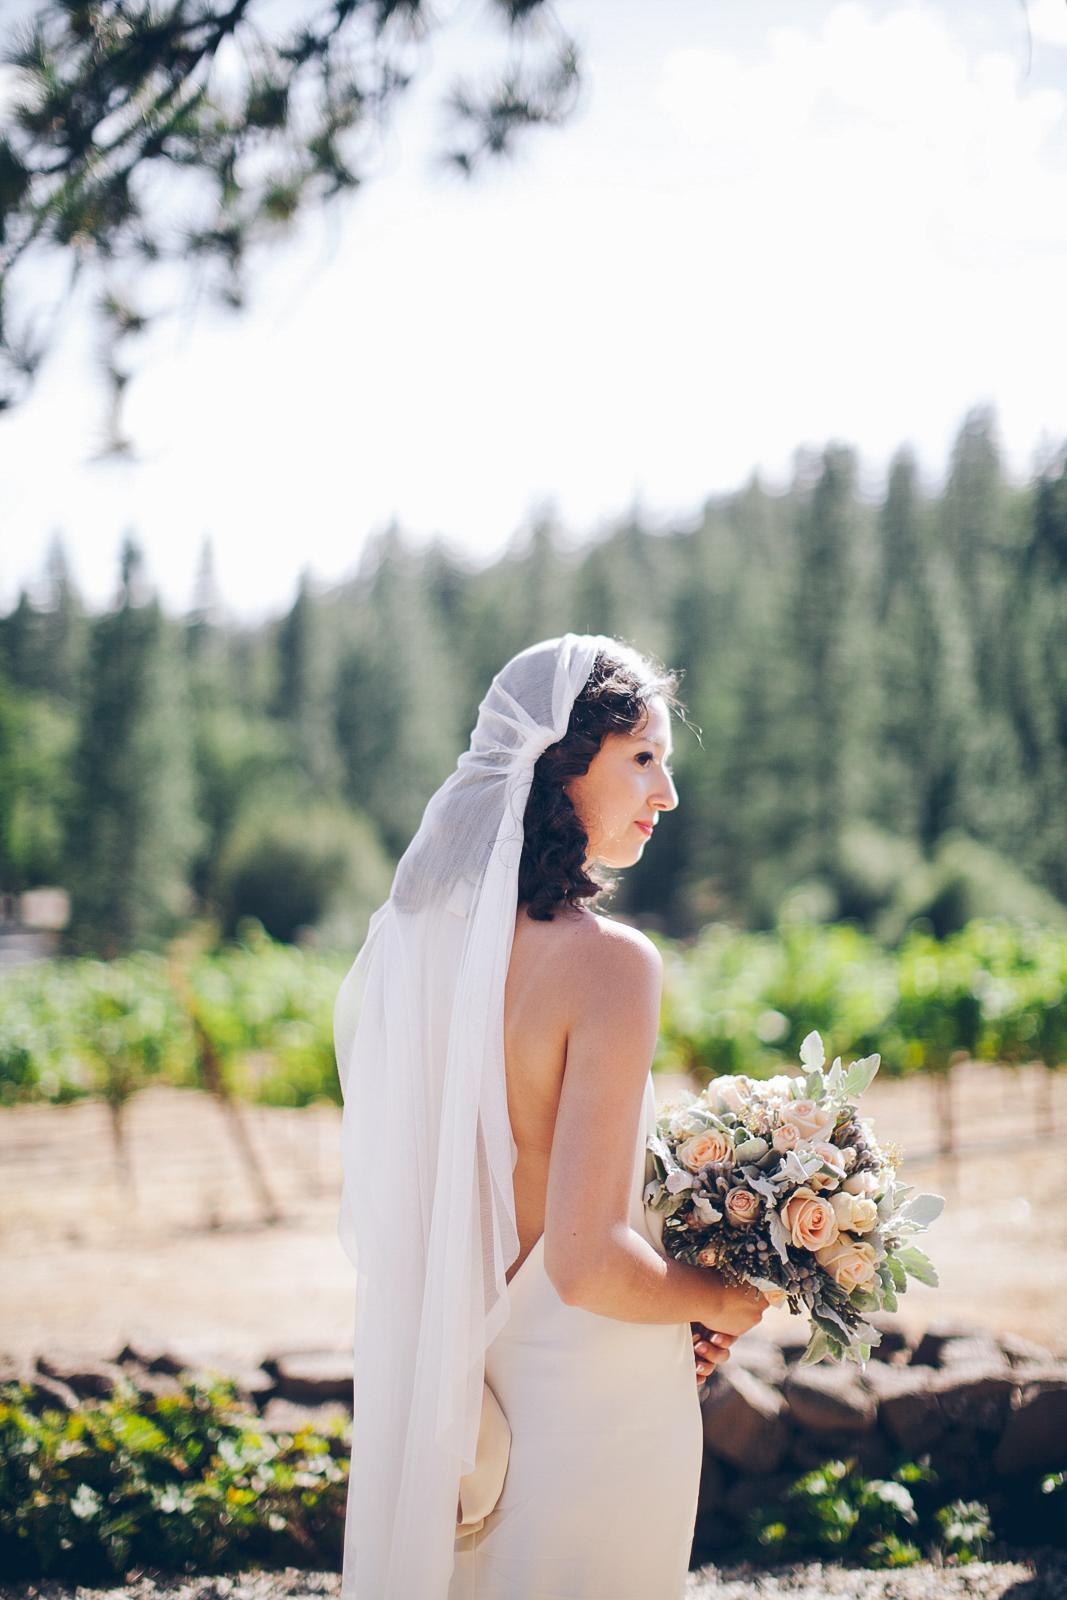 miraflores_winery_wedding_photography_ian_melissa_ebony_siovhan_bokeh_photography_09.jpg